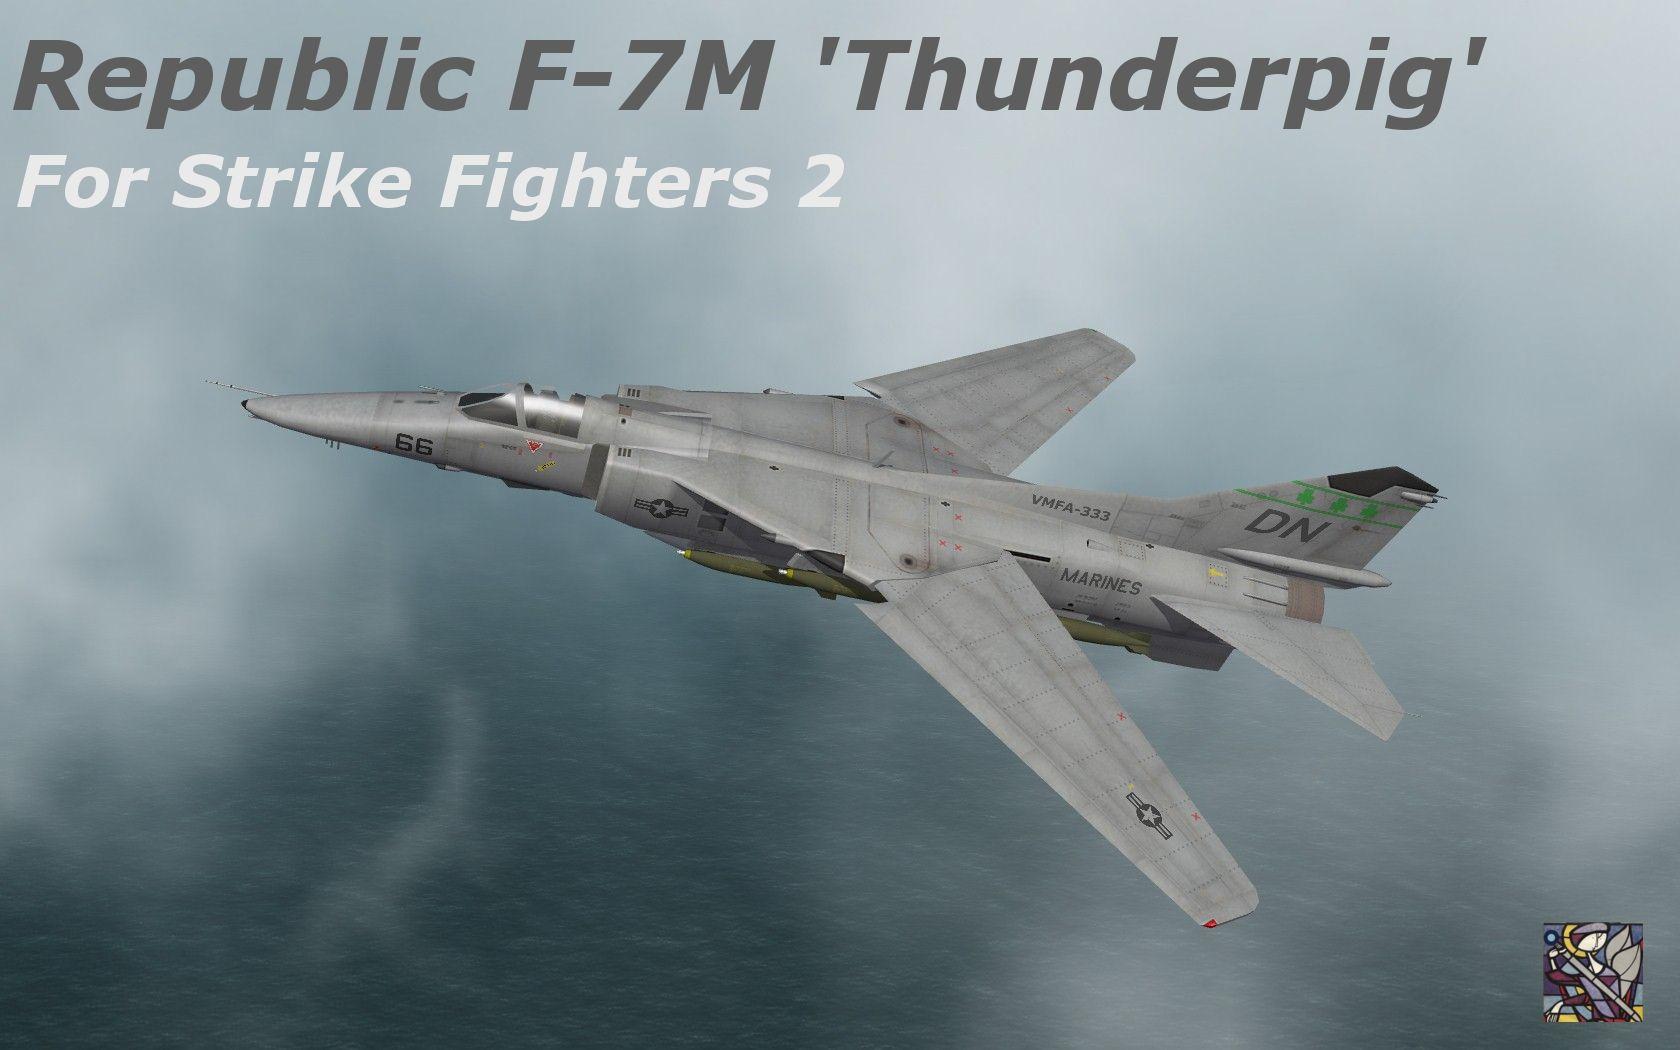 USMCF-7MTHUNDERPIG07.jpg